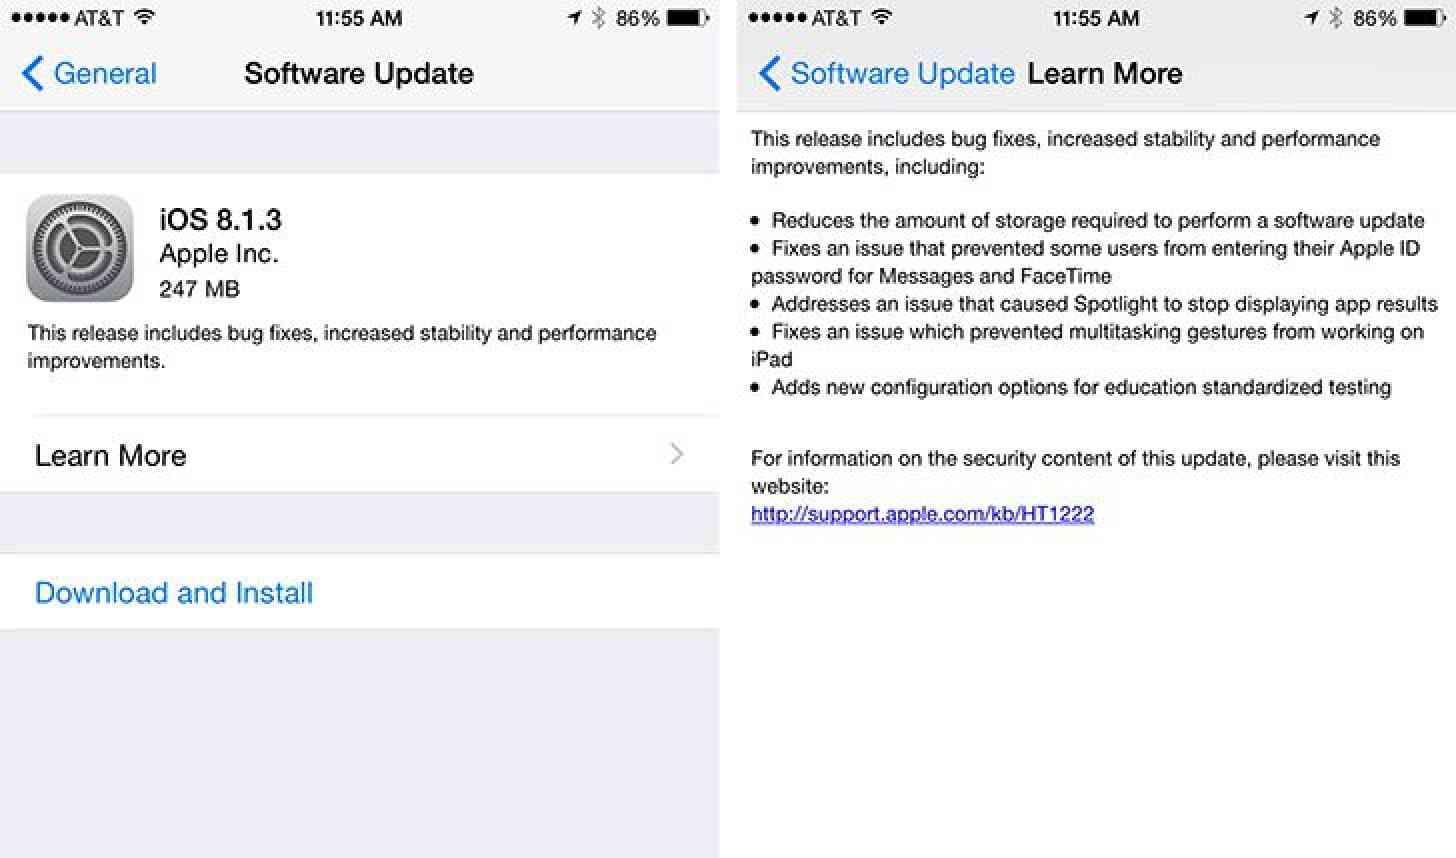 iOS 8.1.3 update screenshots